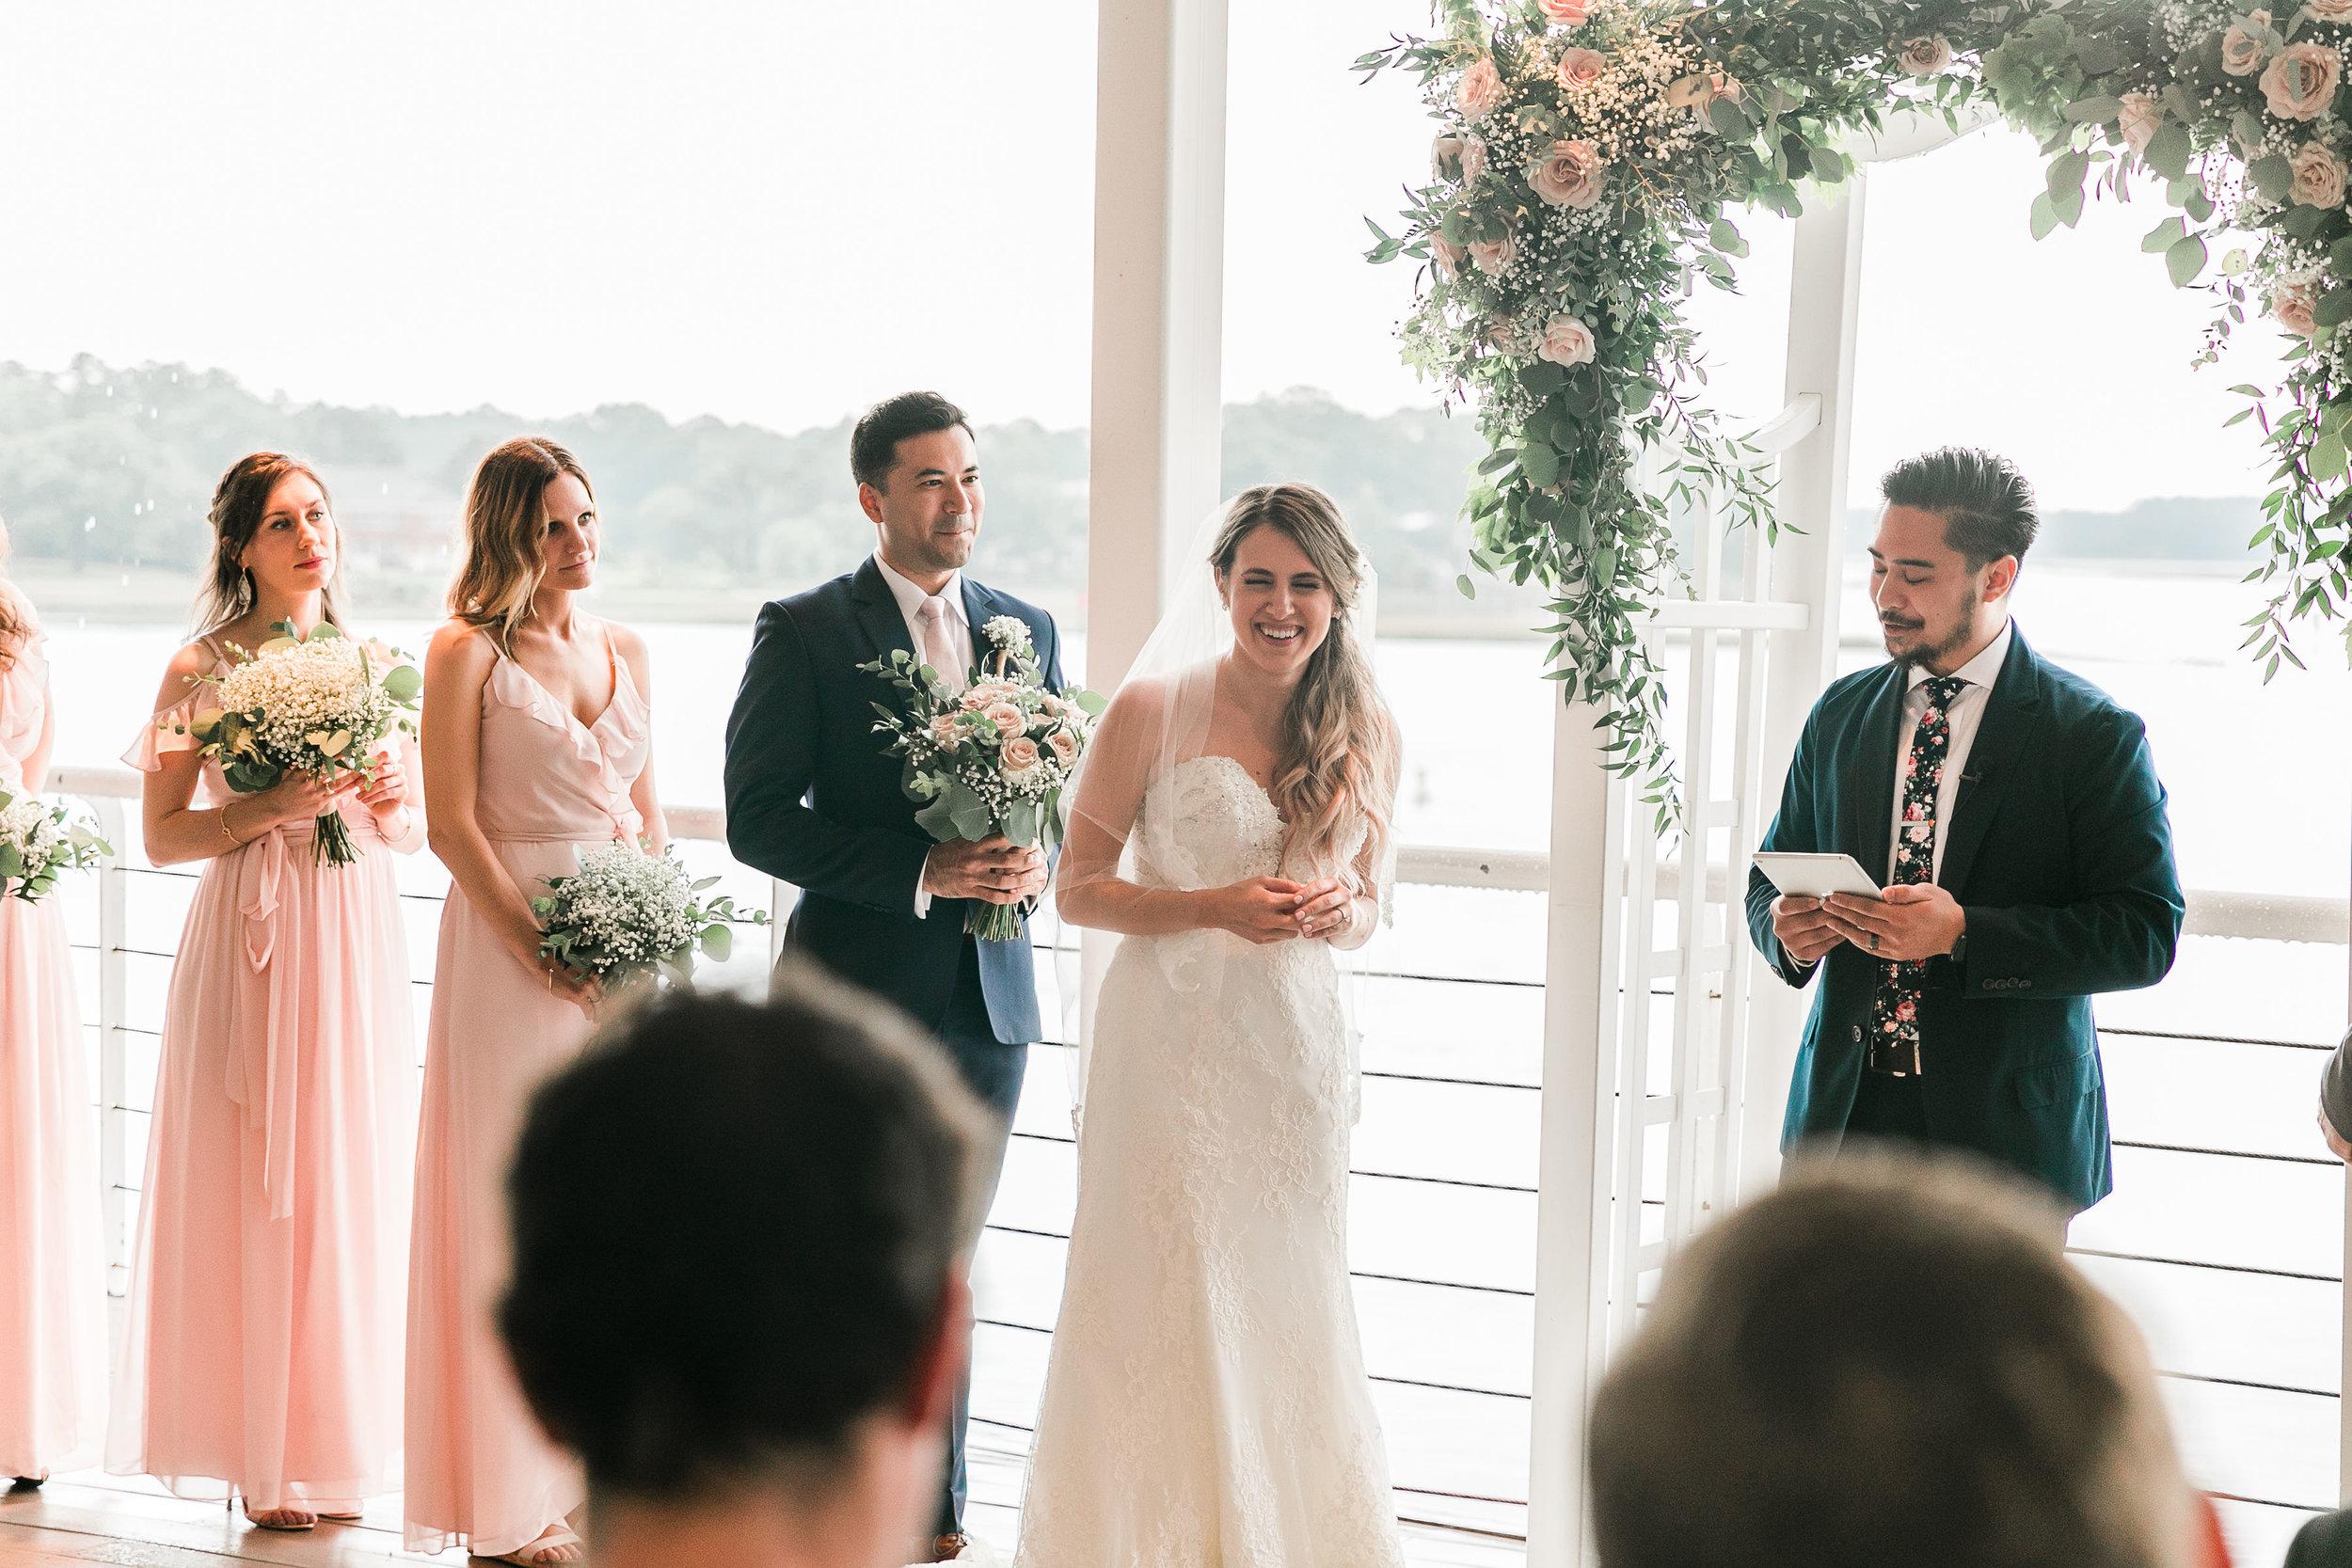 Nicole&Bryce_Ceremony-58.jpg